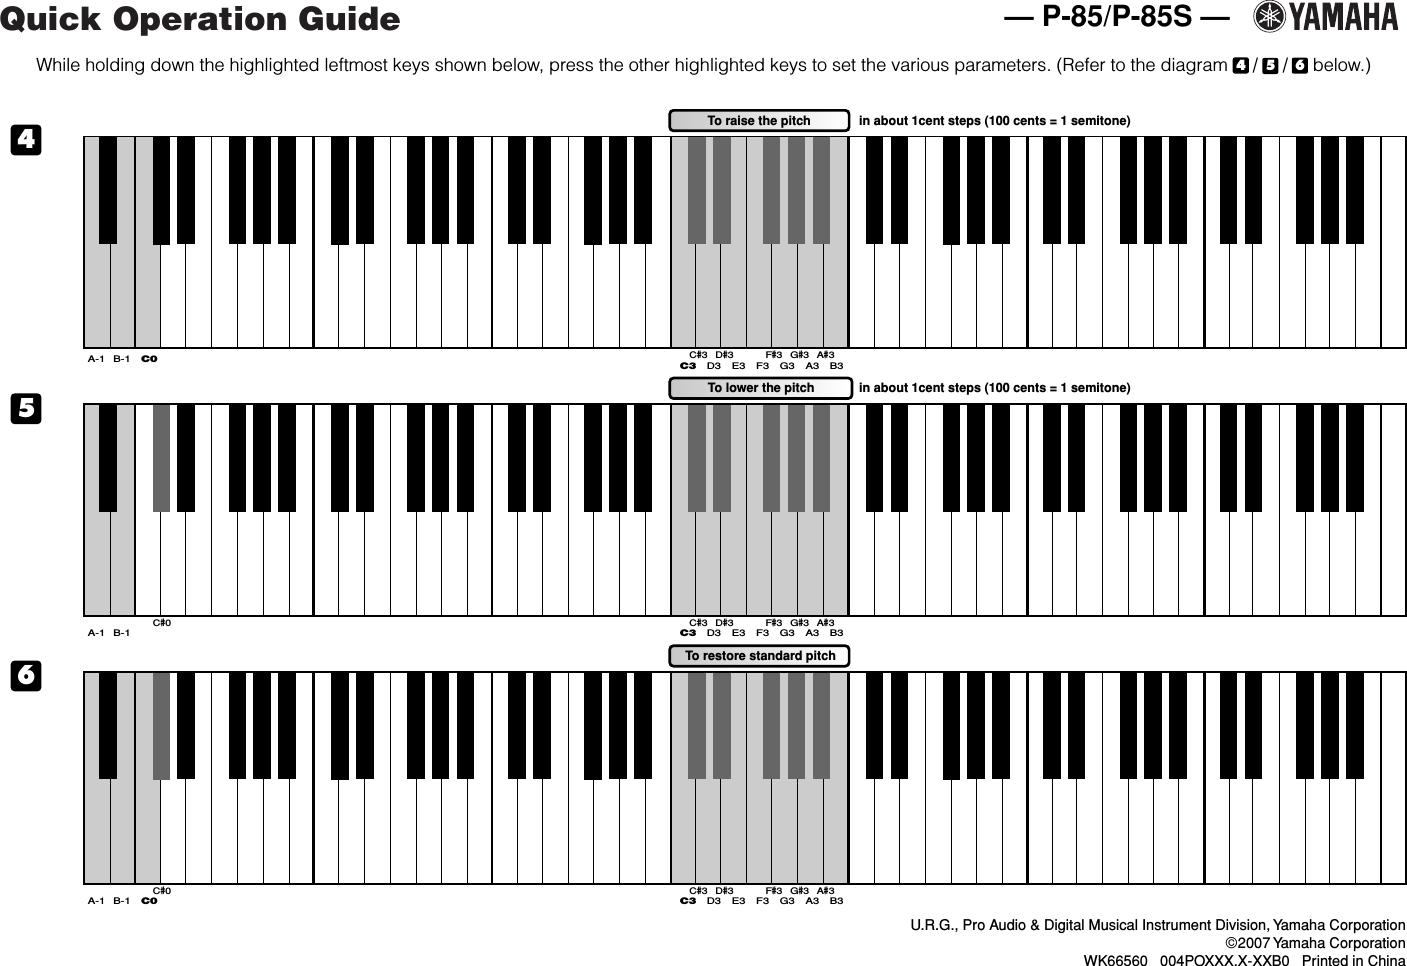 Yamaha P 85/P 85S Quick Operation Guide P85 En Qg B0